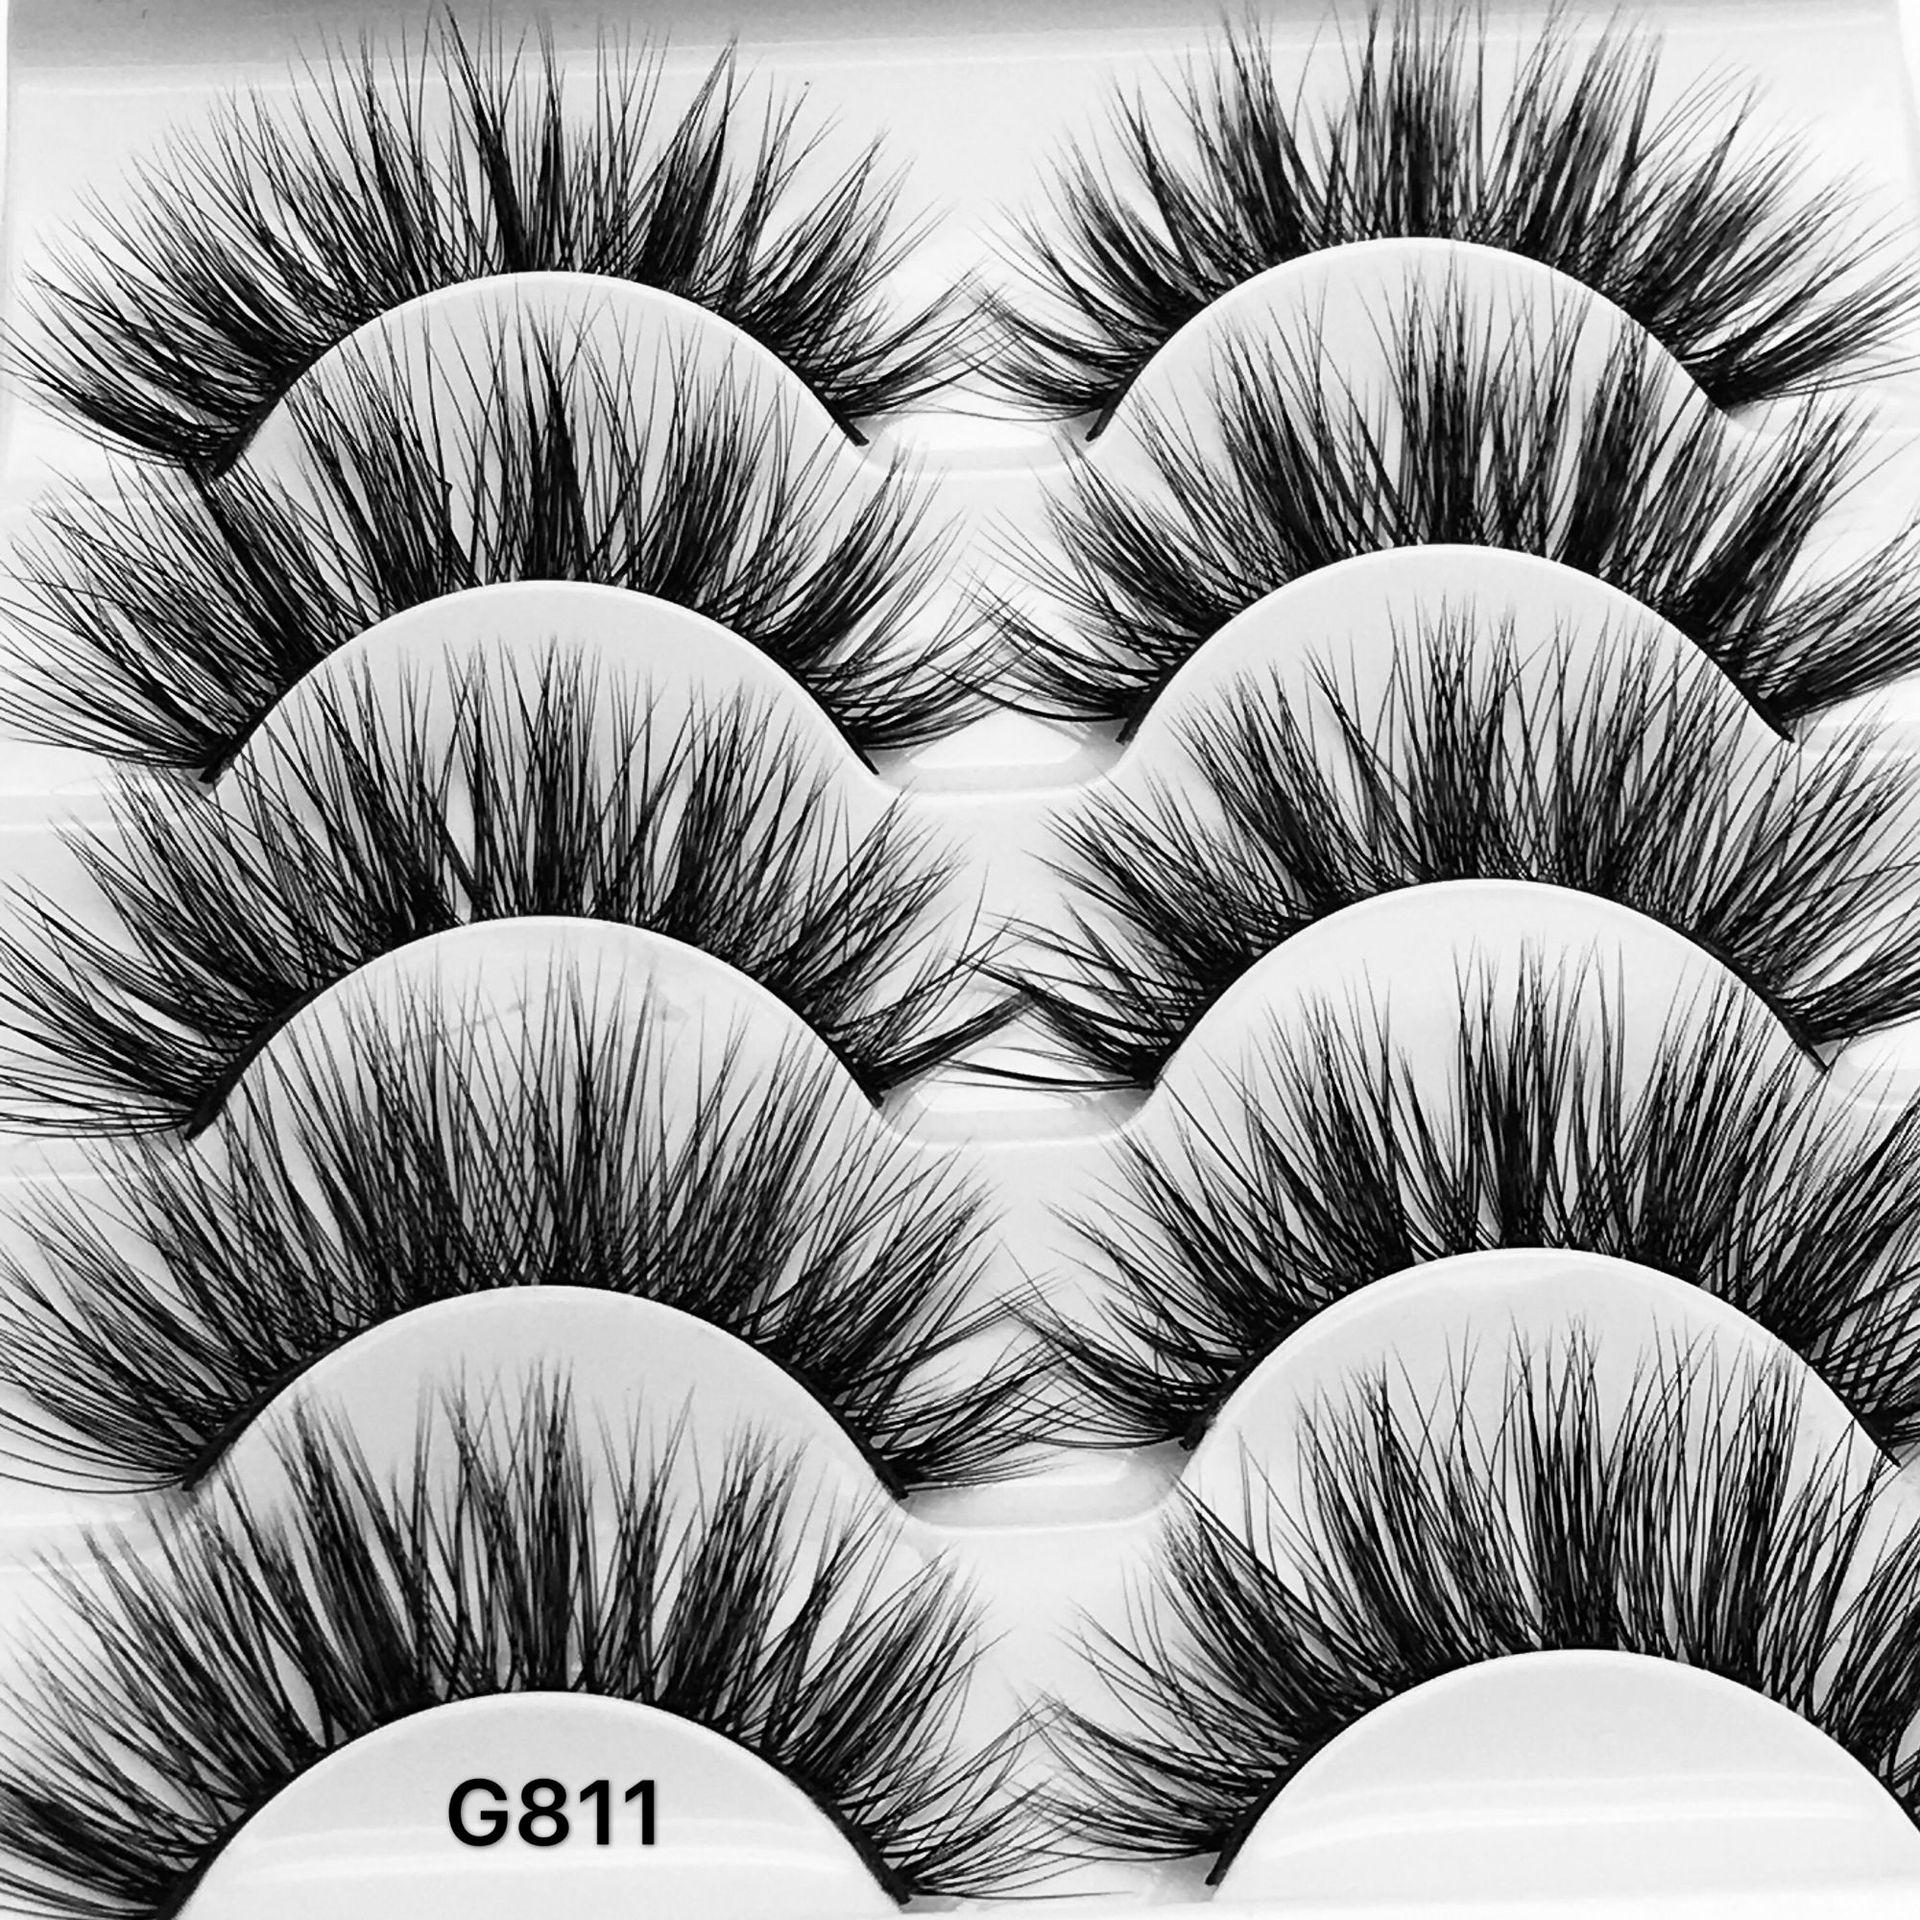 G811 5 Pairs False Eyelashes 3D Mink Lashes Natural Makeup Eyelash Extension Cross Volume Soft Fake Eye Lashes Winged Faux Cils